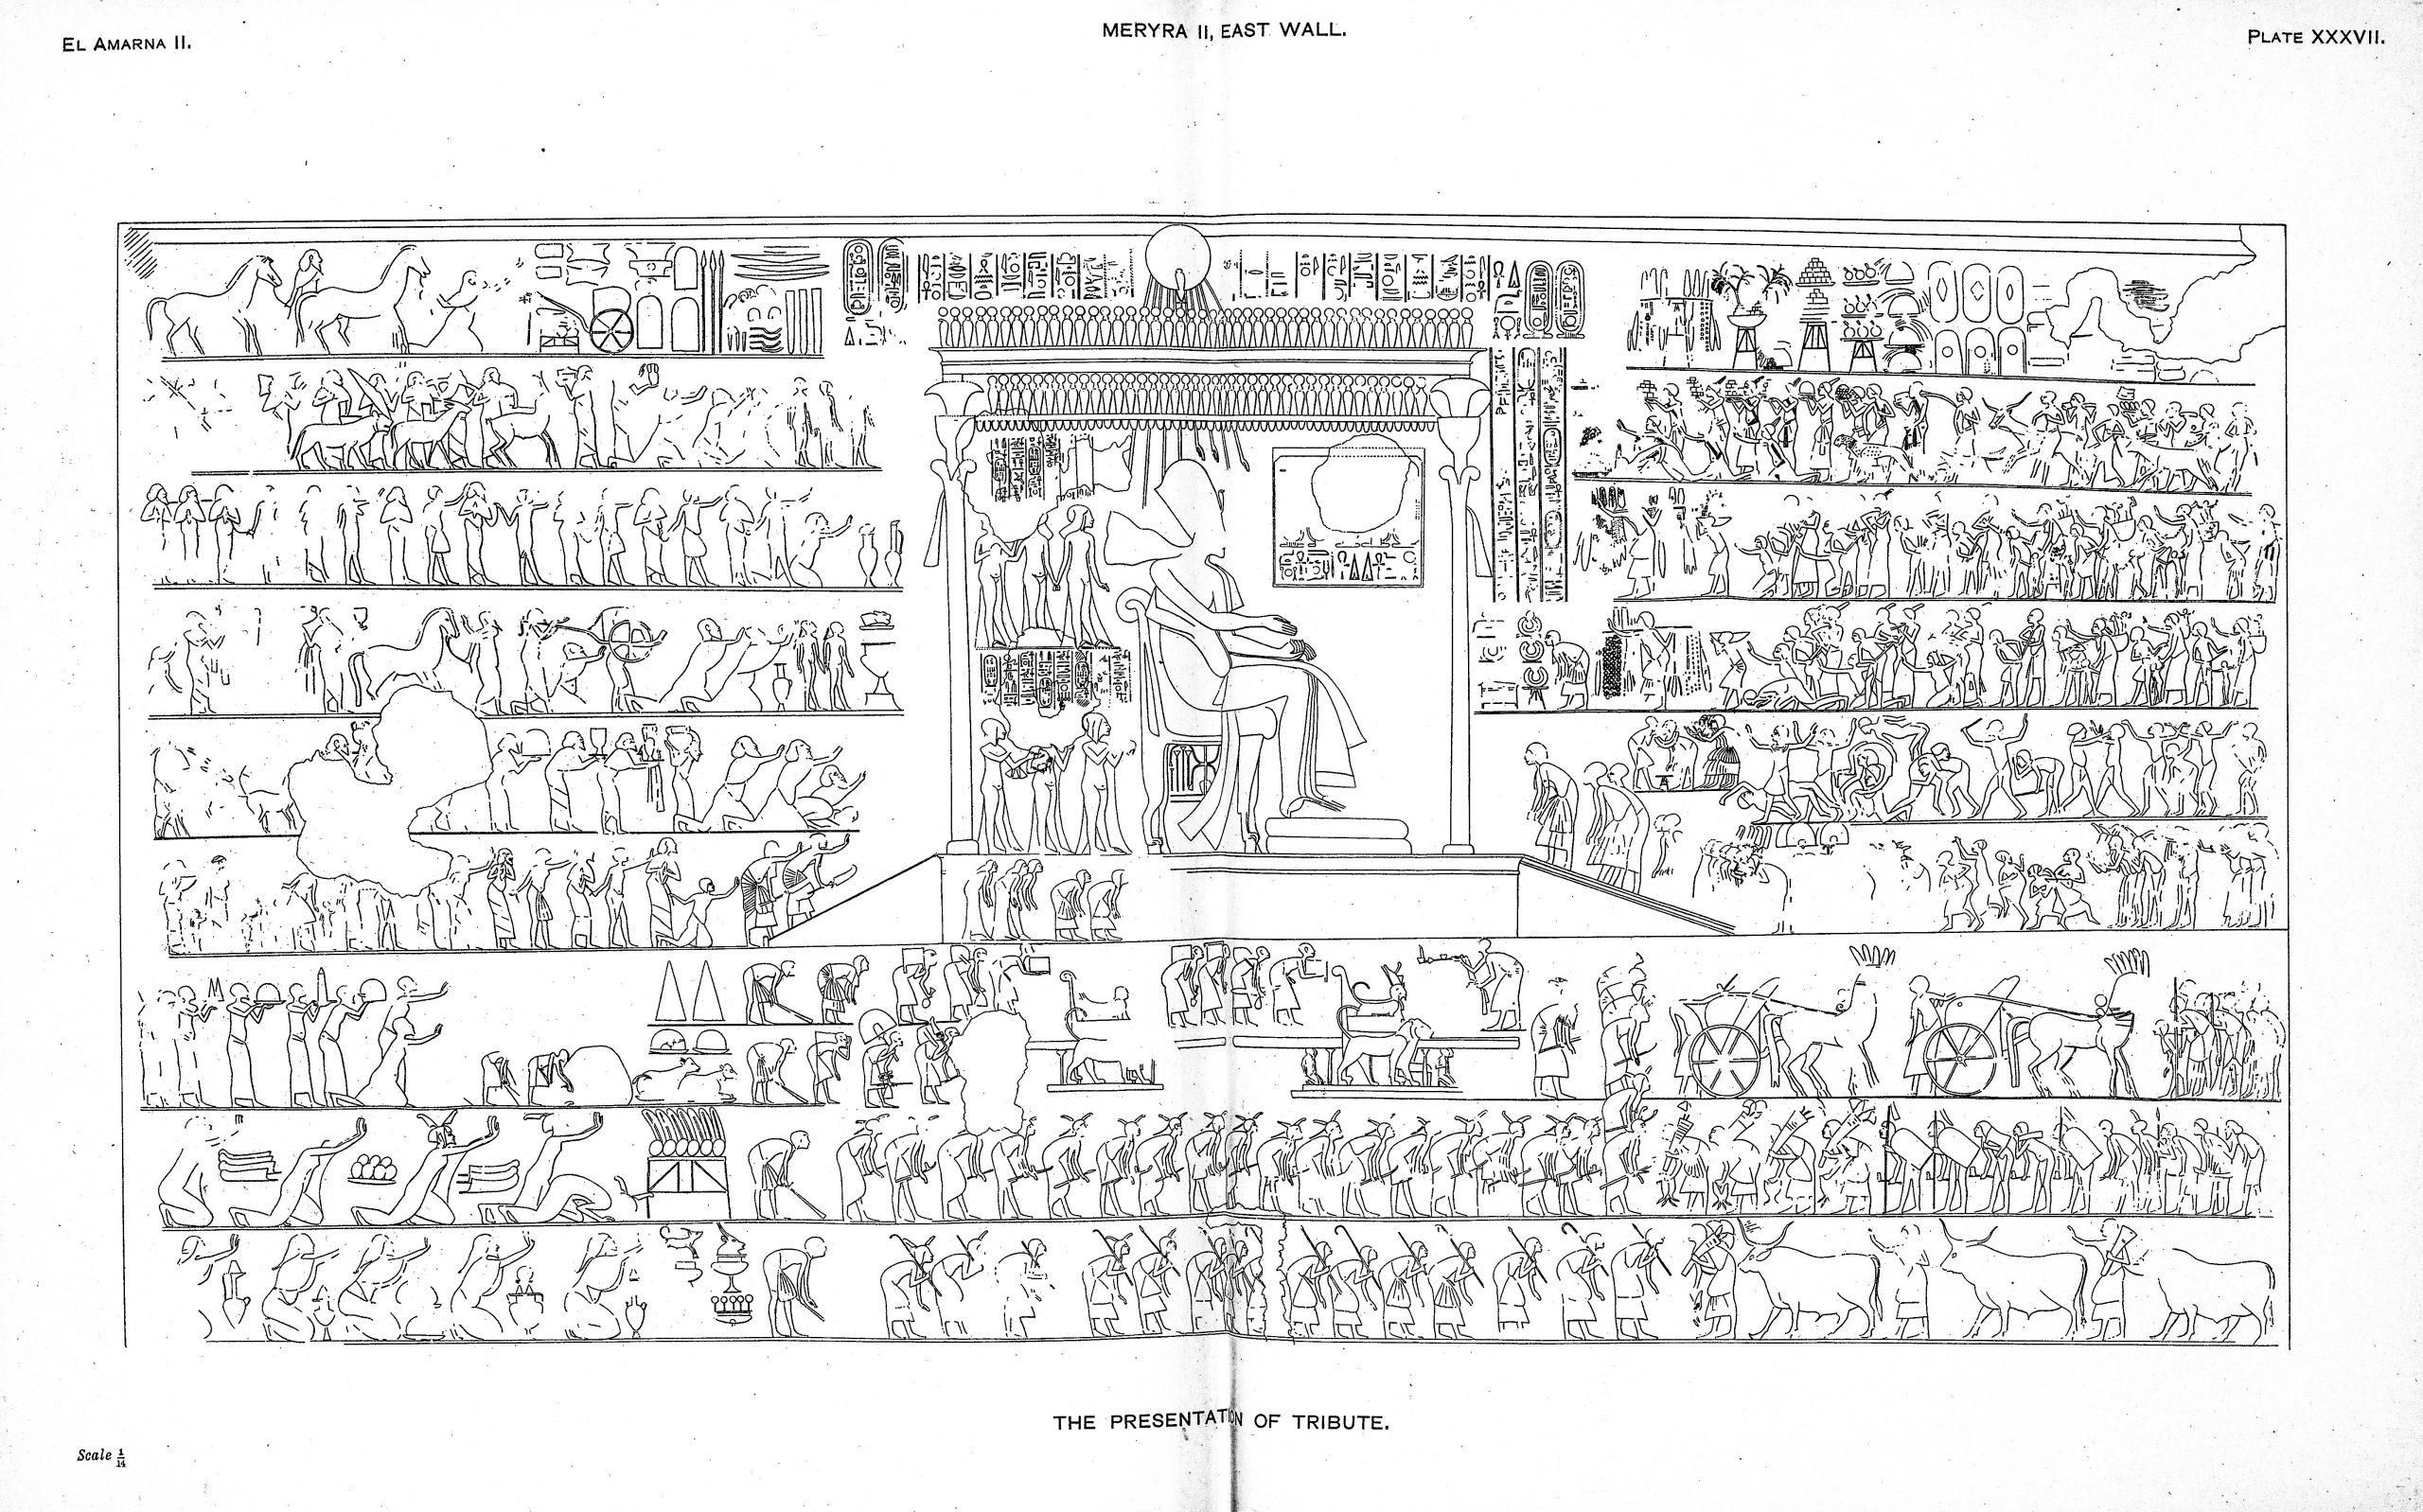 Figure 3, paying tribute to Akhenaten in year 12, tomb of Meryra II (de G. Davies, 1905, p. pl. XXXVII)